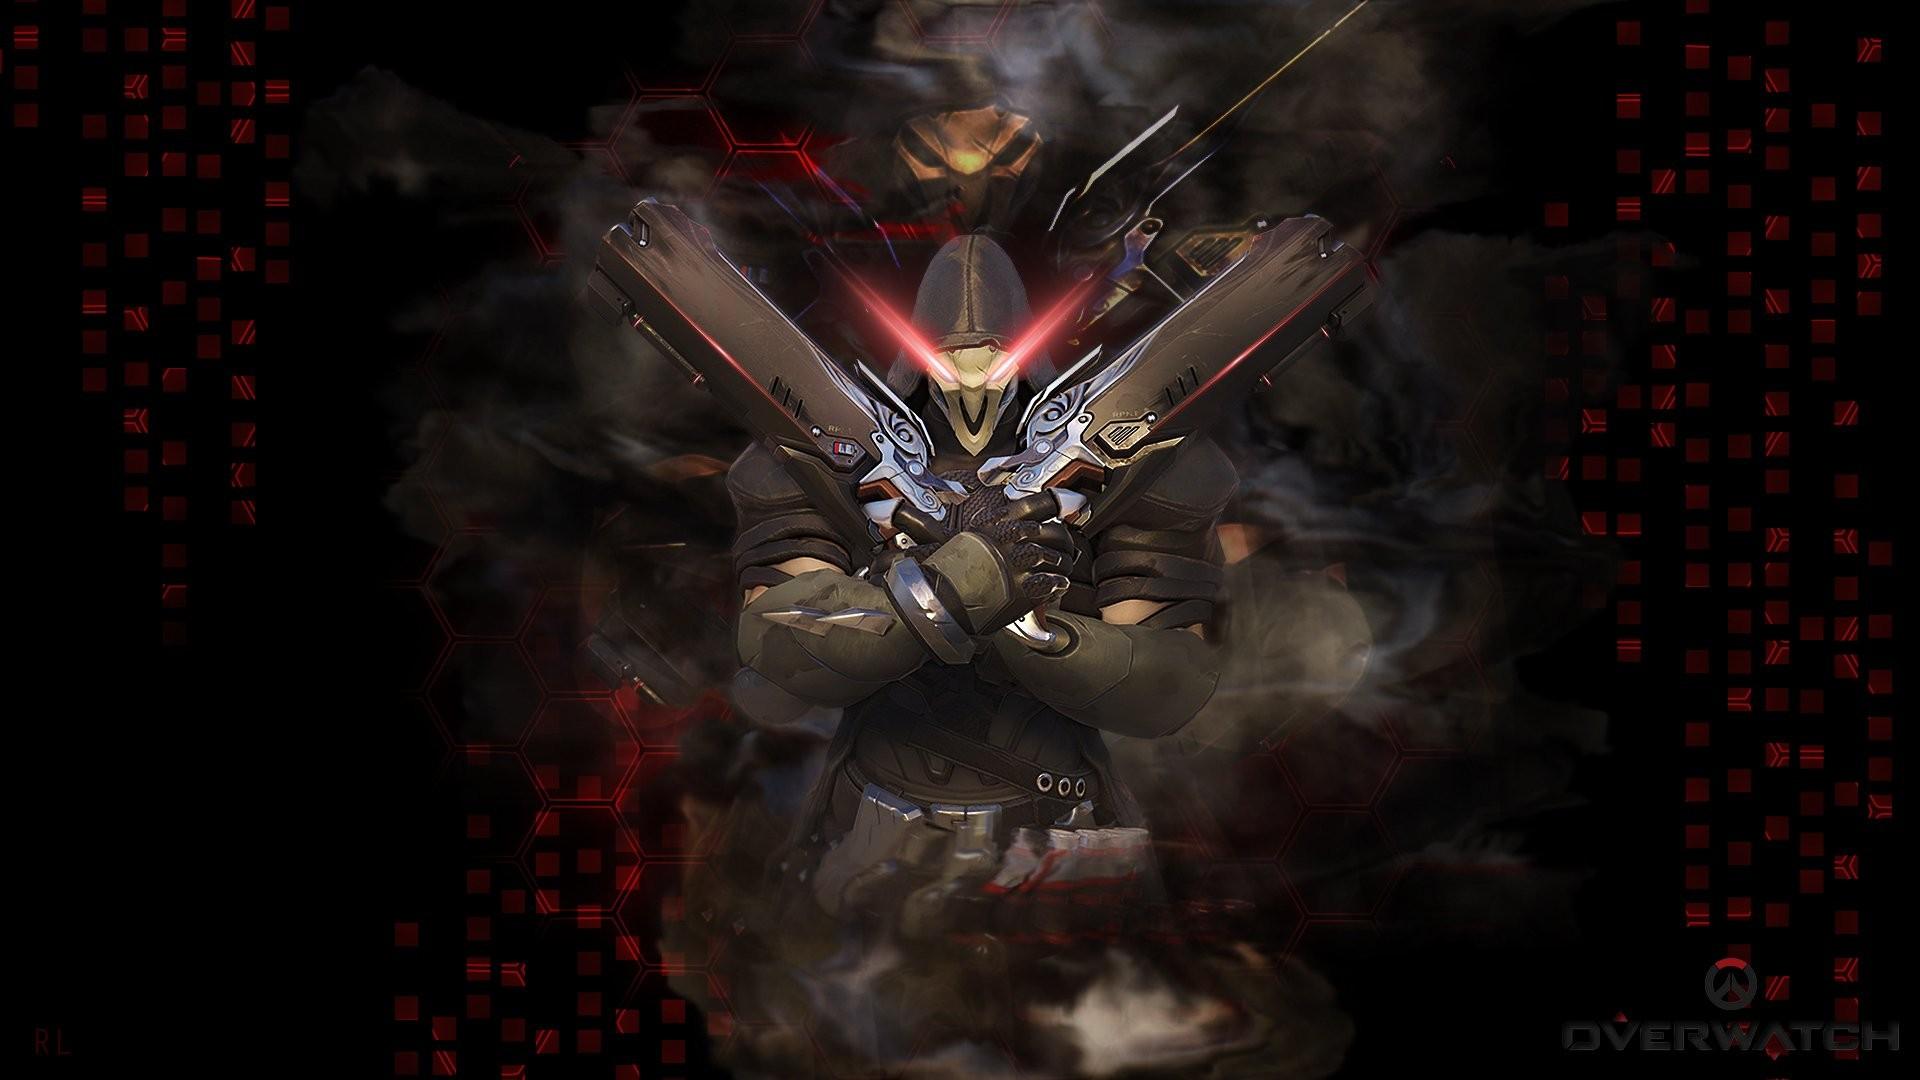 Overwatch 4k wallpaper download free stunning high - Overwatch wallpaper 4k ...